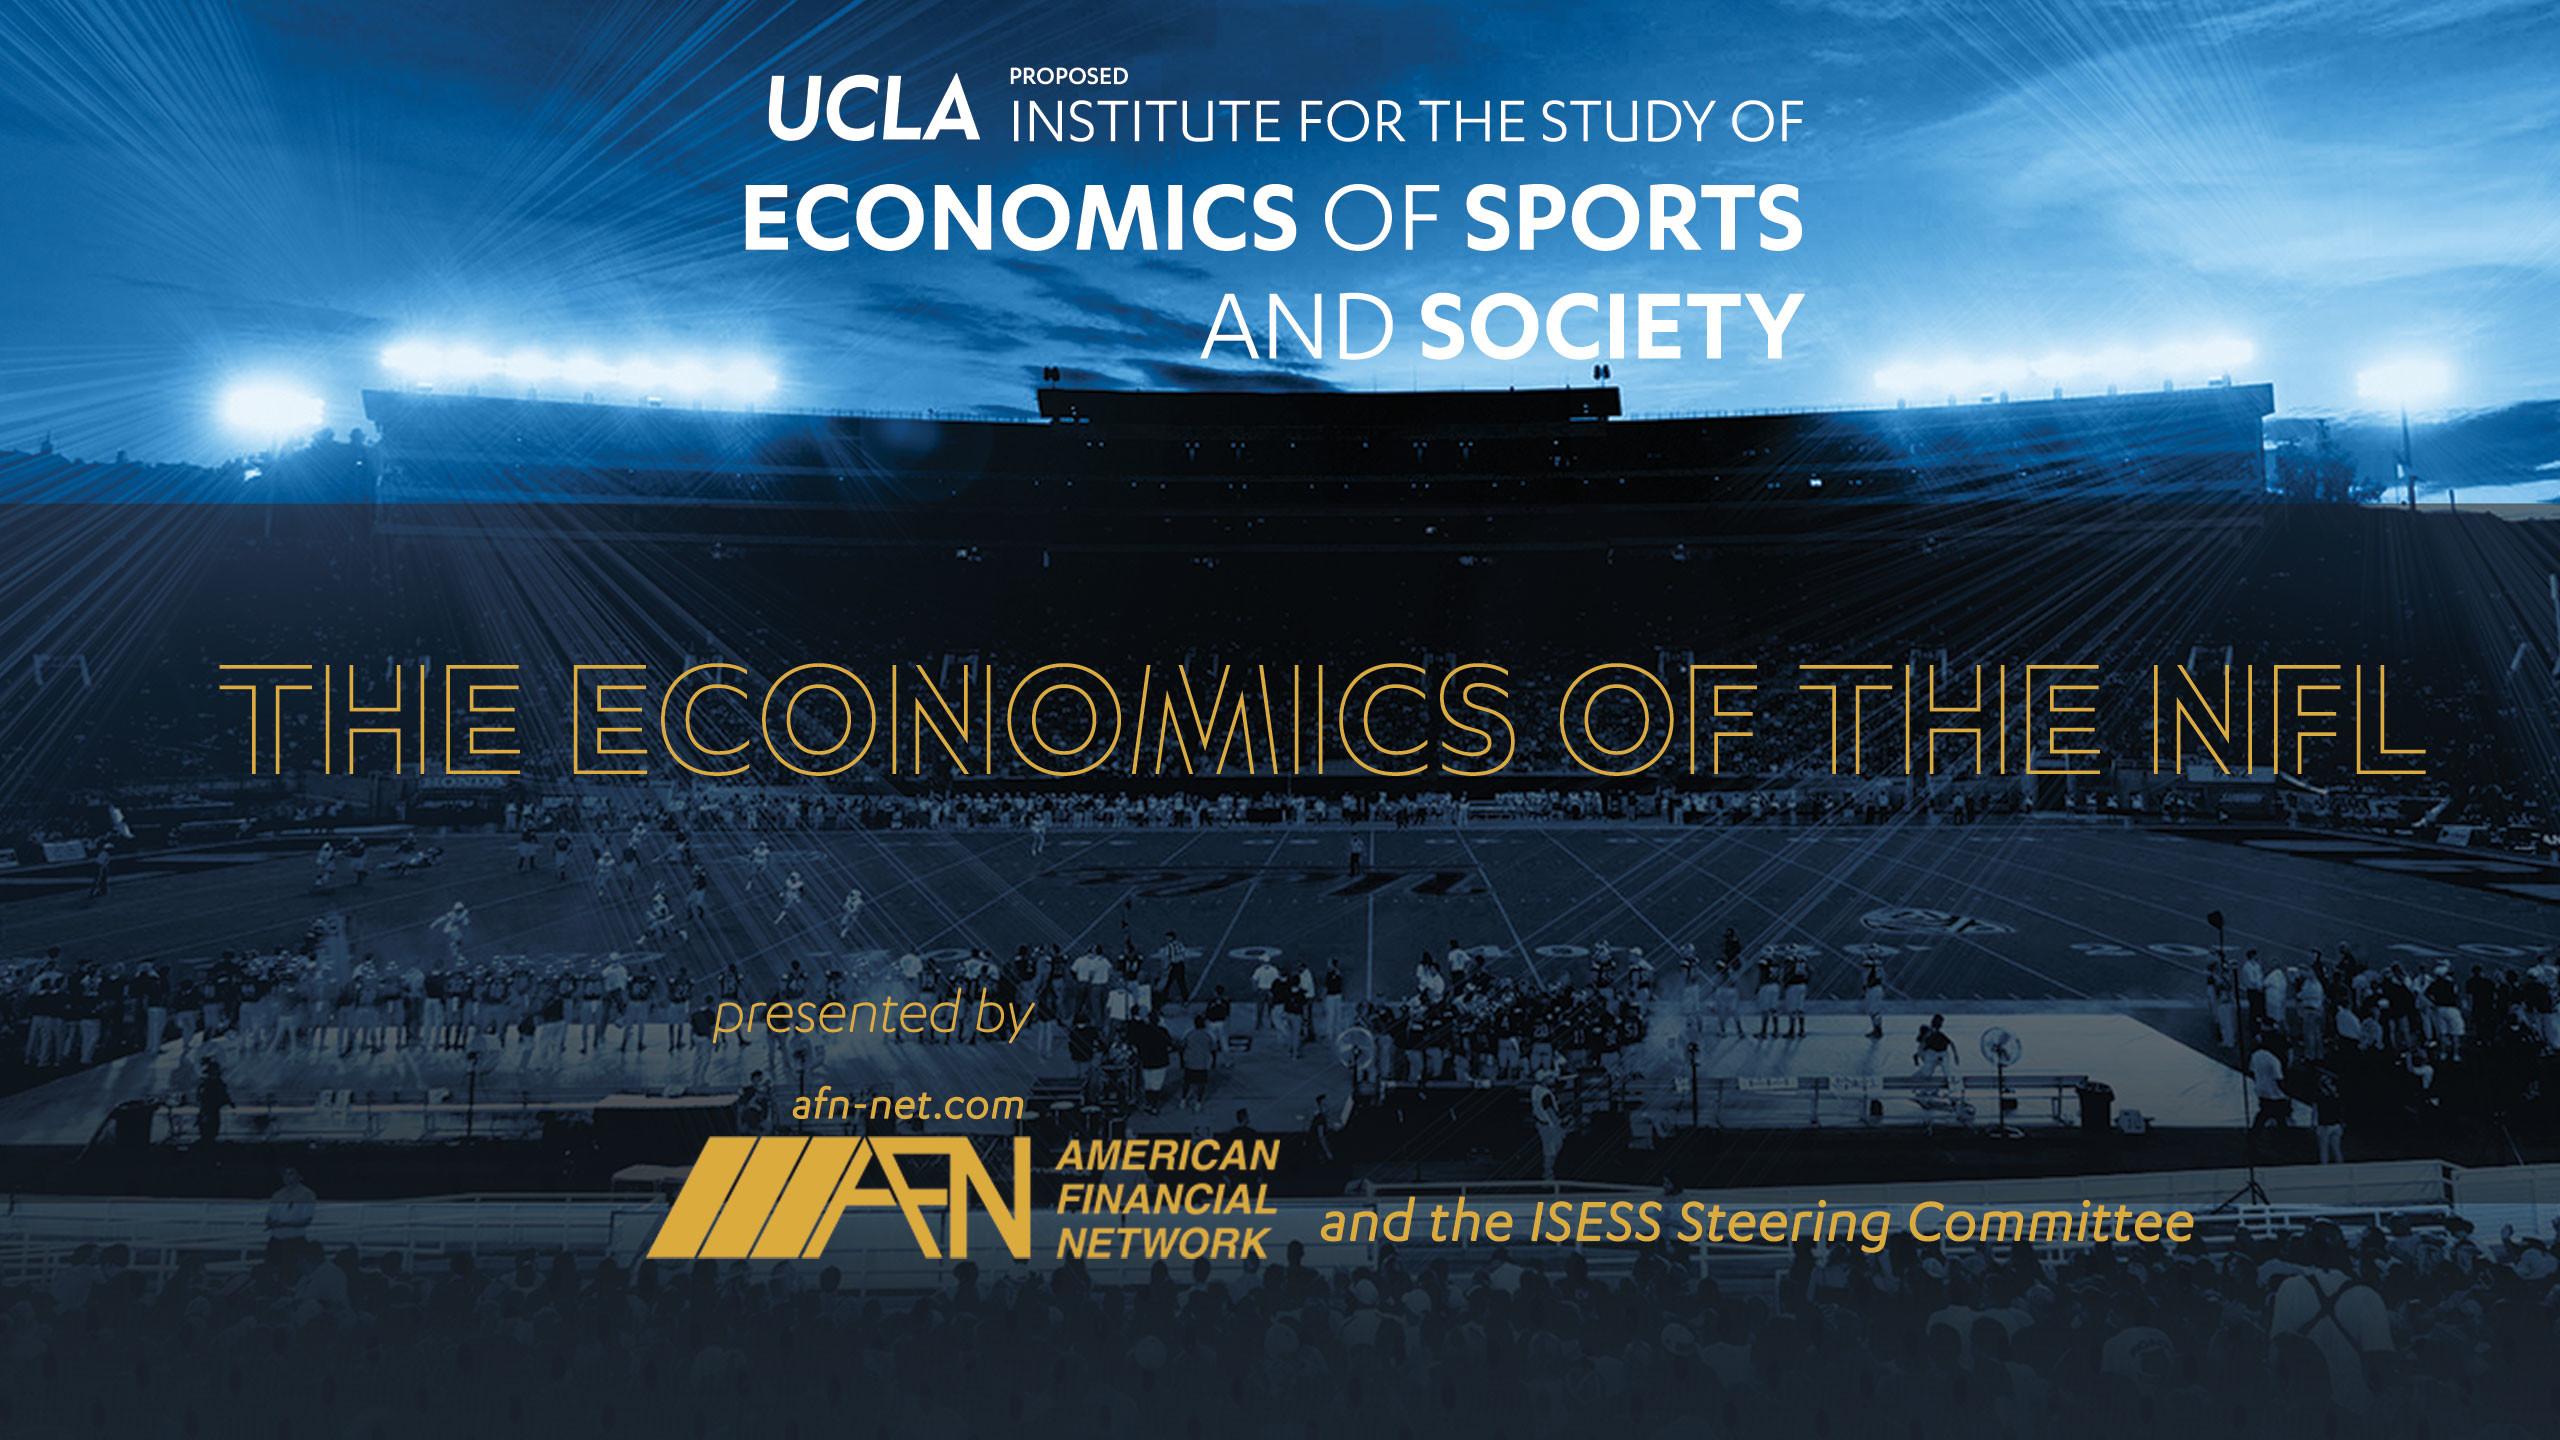 The Department of Economics Presents The Economics of the NFL